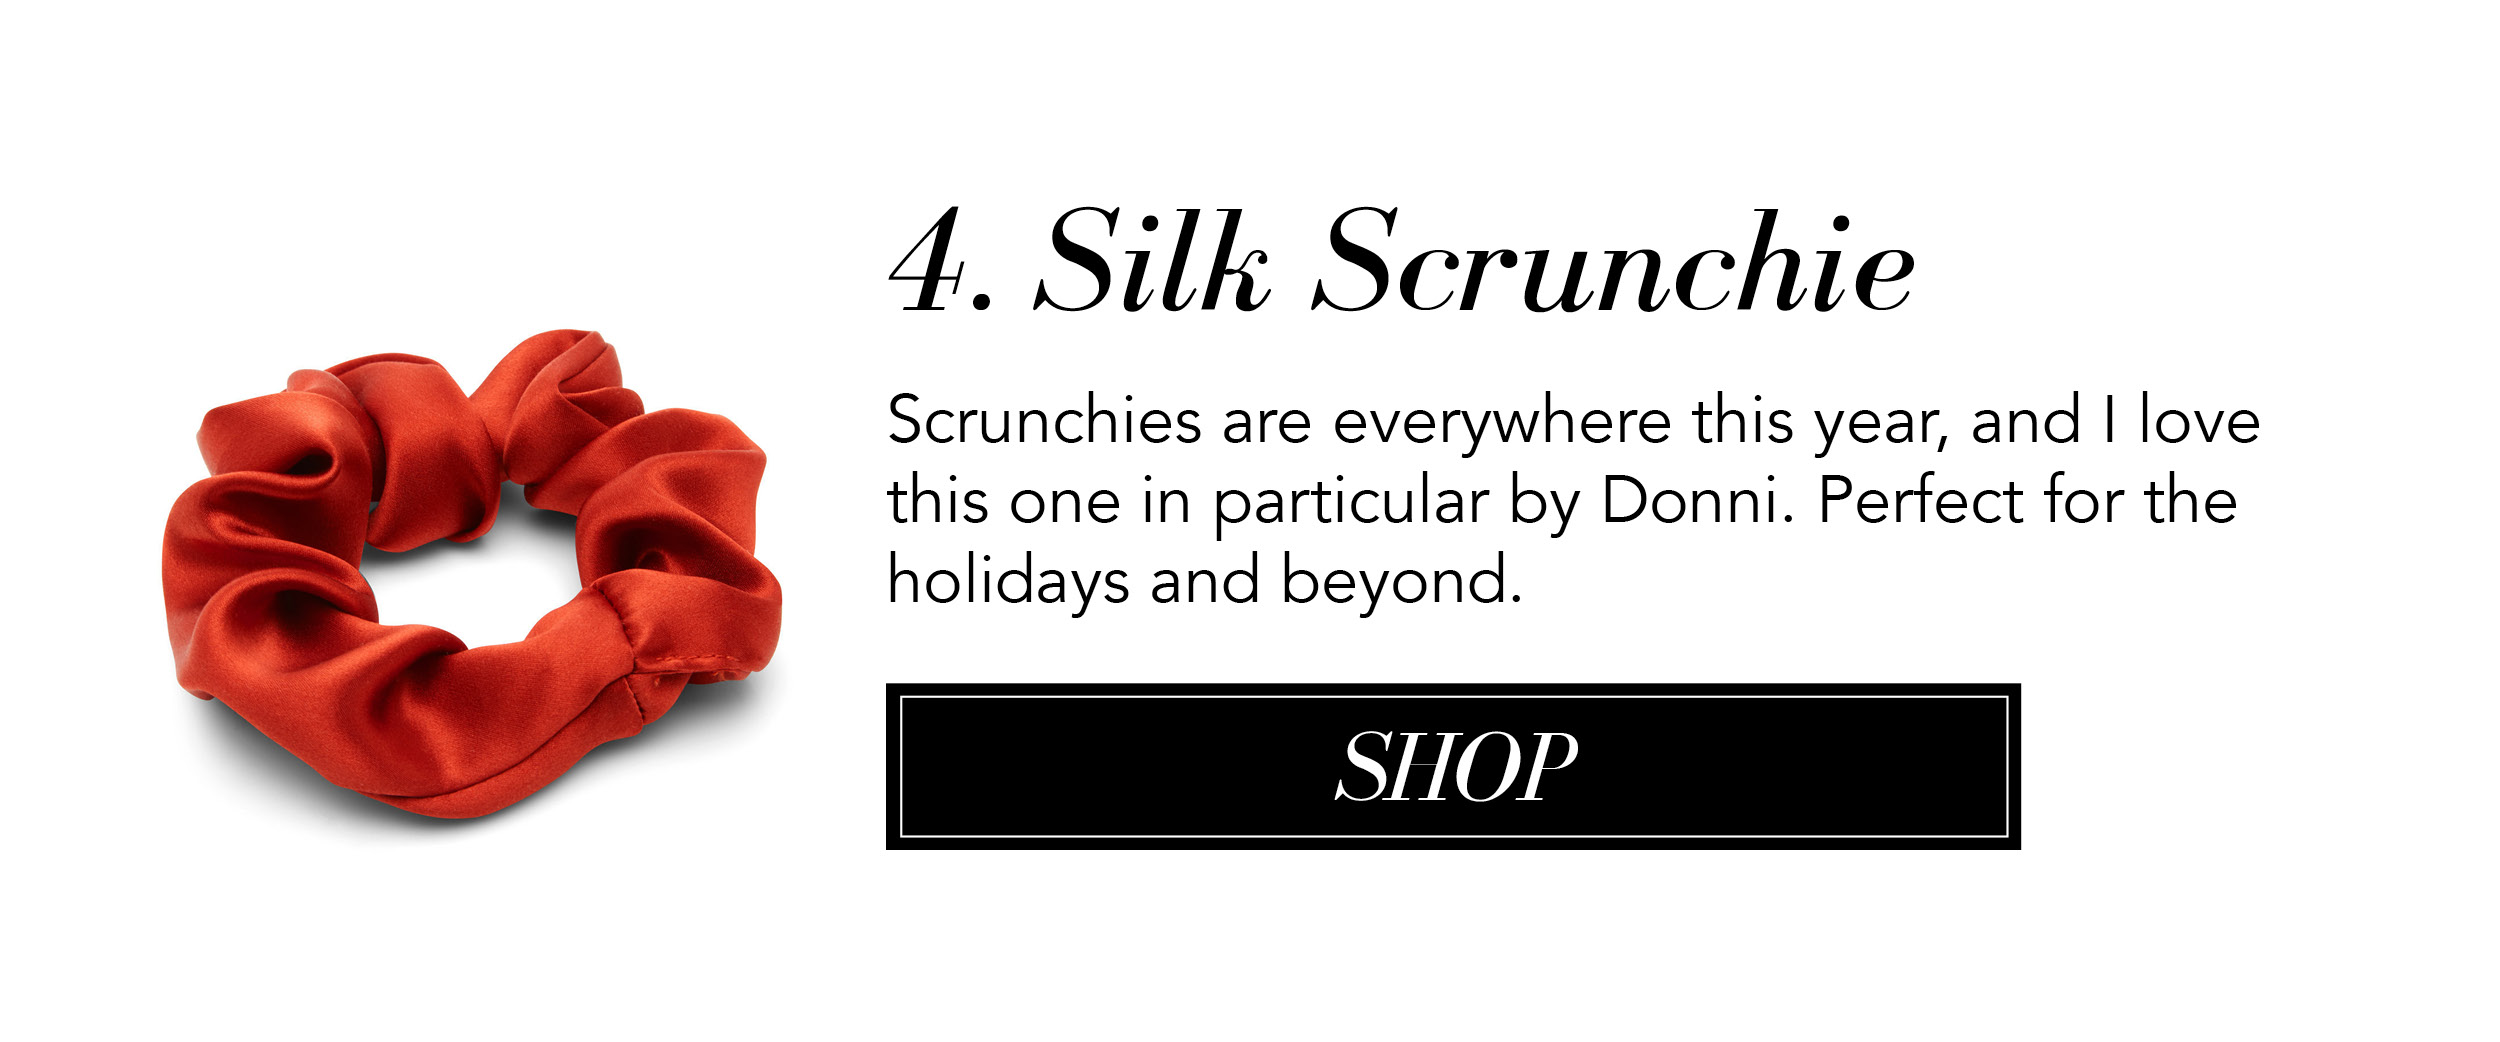 Donni-scrunchie.jpg